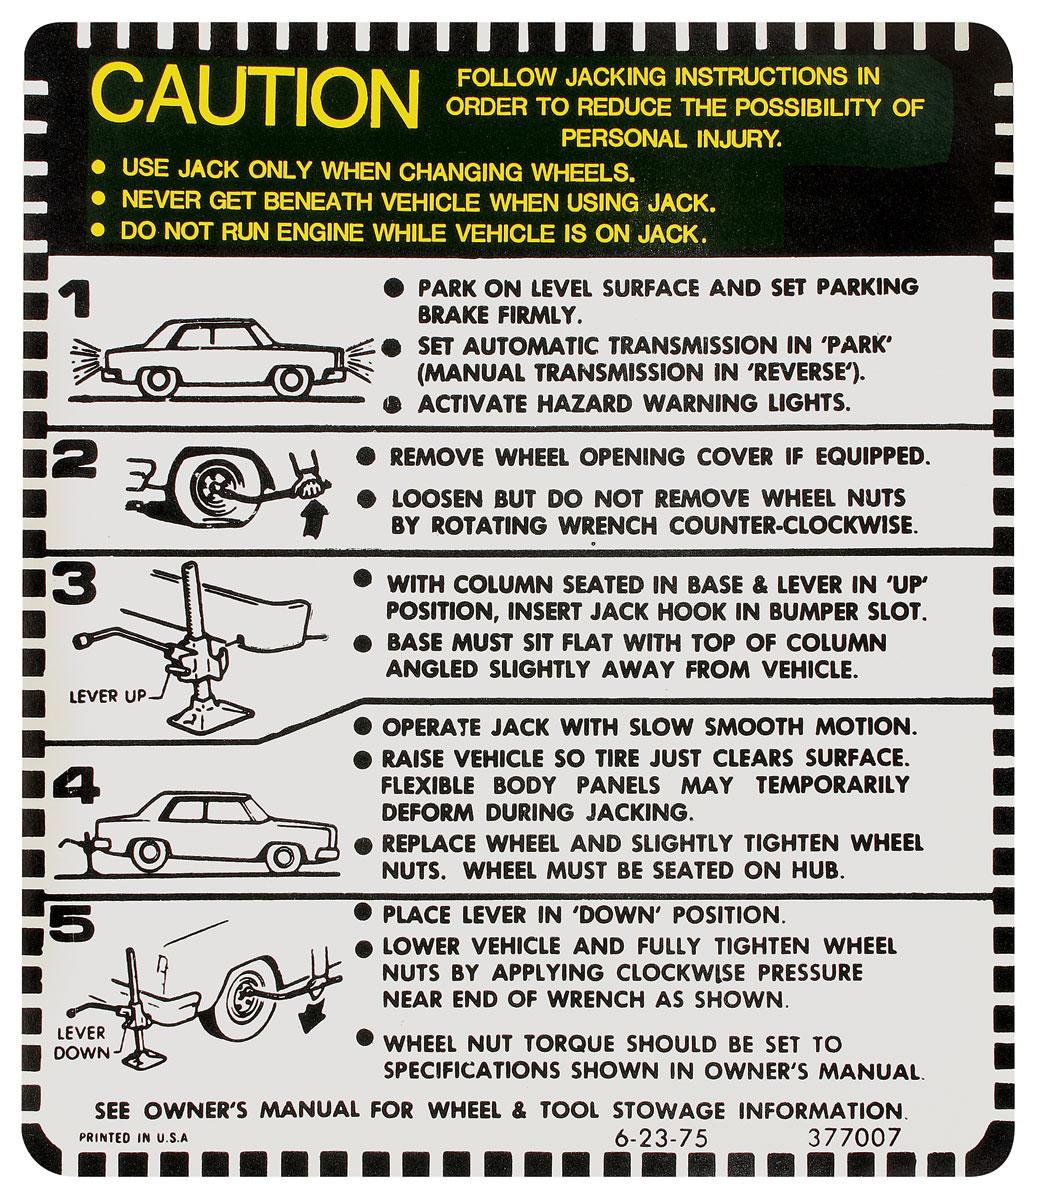 Decal, 1975-77 Cutlass, Jacking Instructions, Exc. CNV/WGN